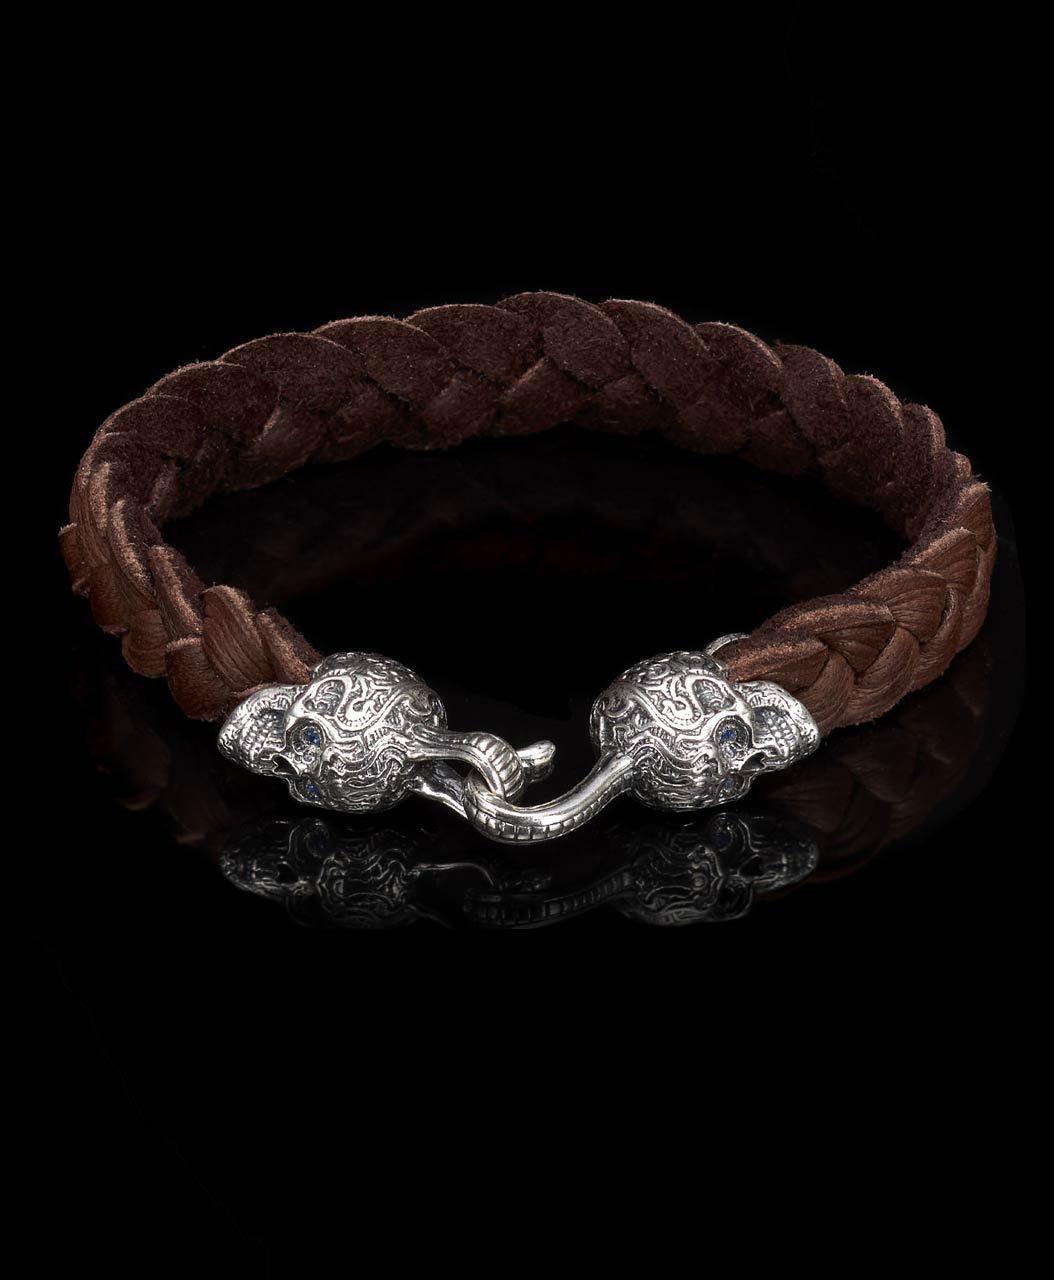 William Henry Braided Leather Buccaneer Bracelet With Engraved Skulls